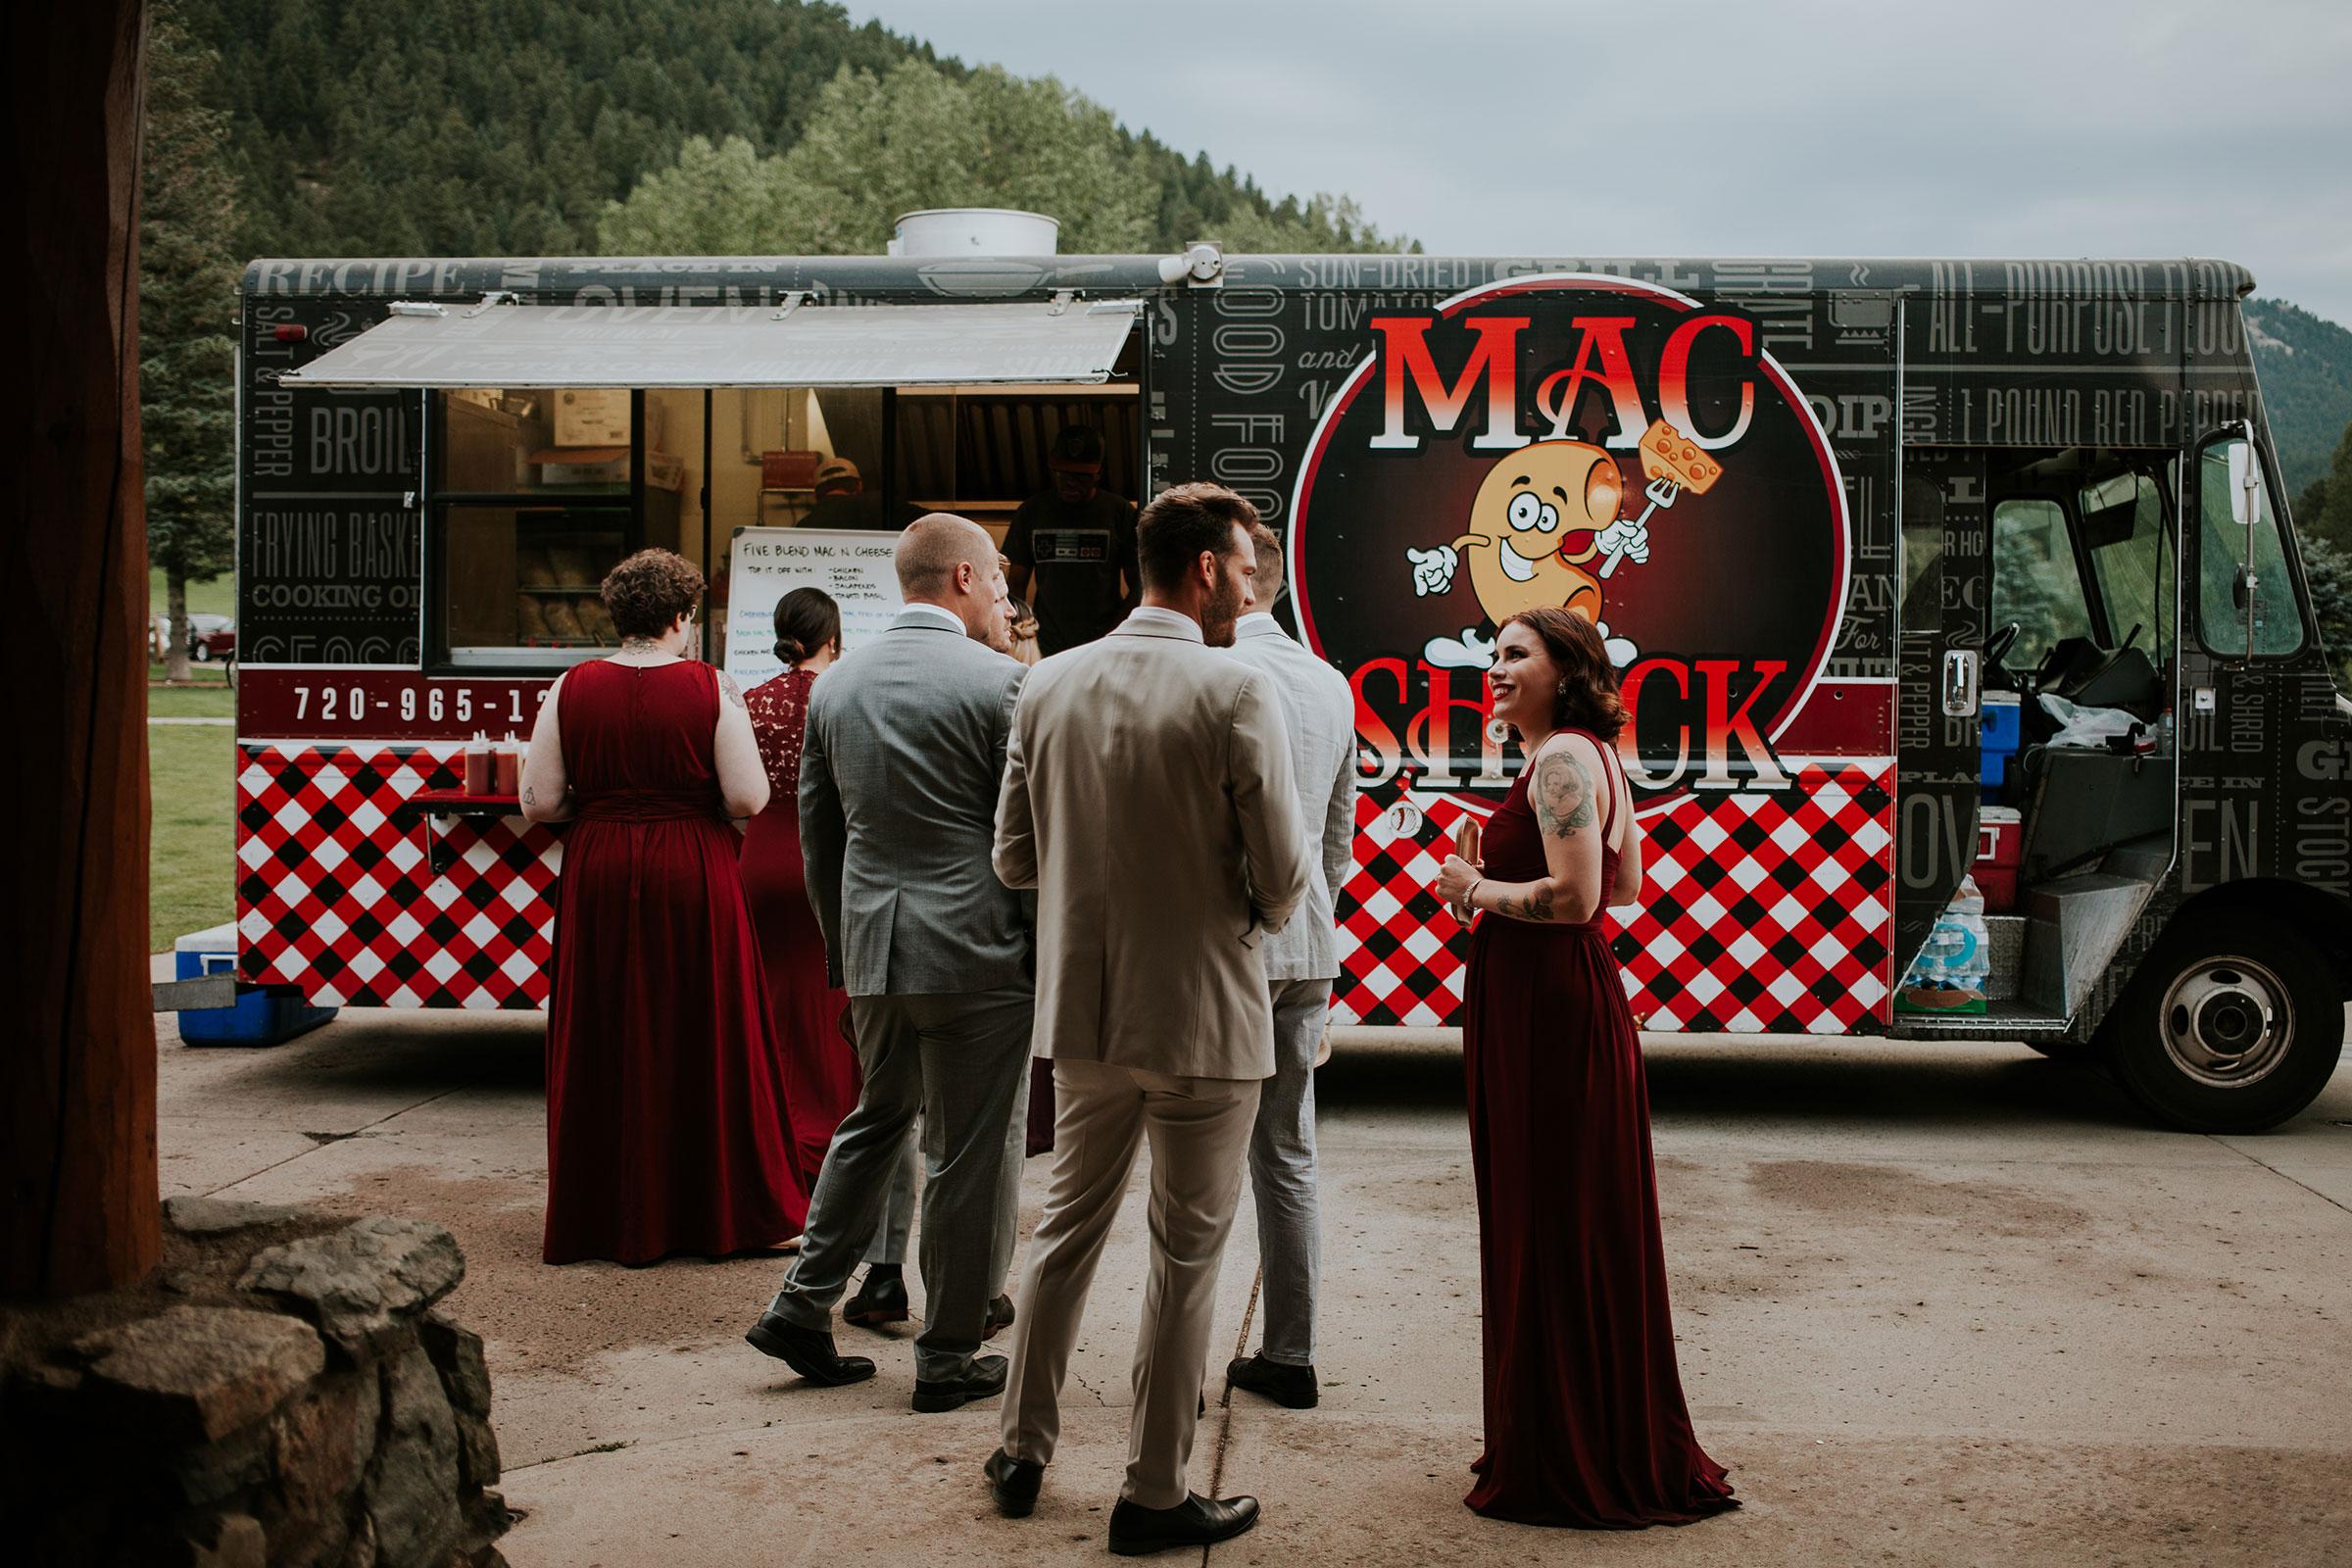 guest-getting-food-at-mac-shack-food-truck-evergreen-lake-colorado-raelyn-ramey-photography.jpg